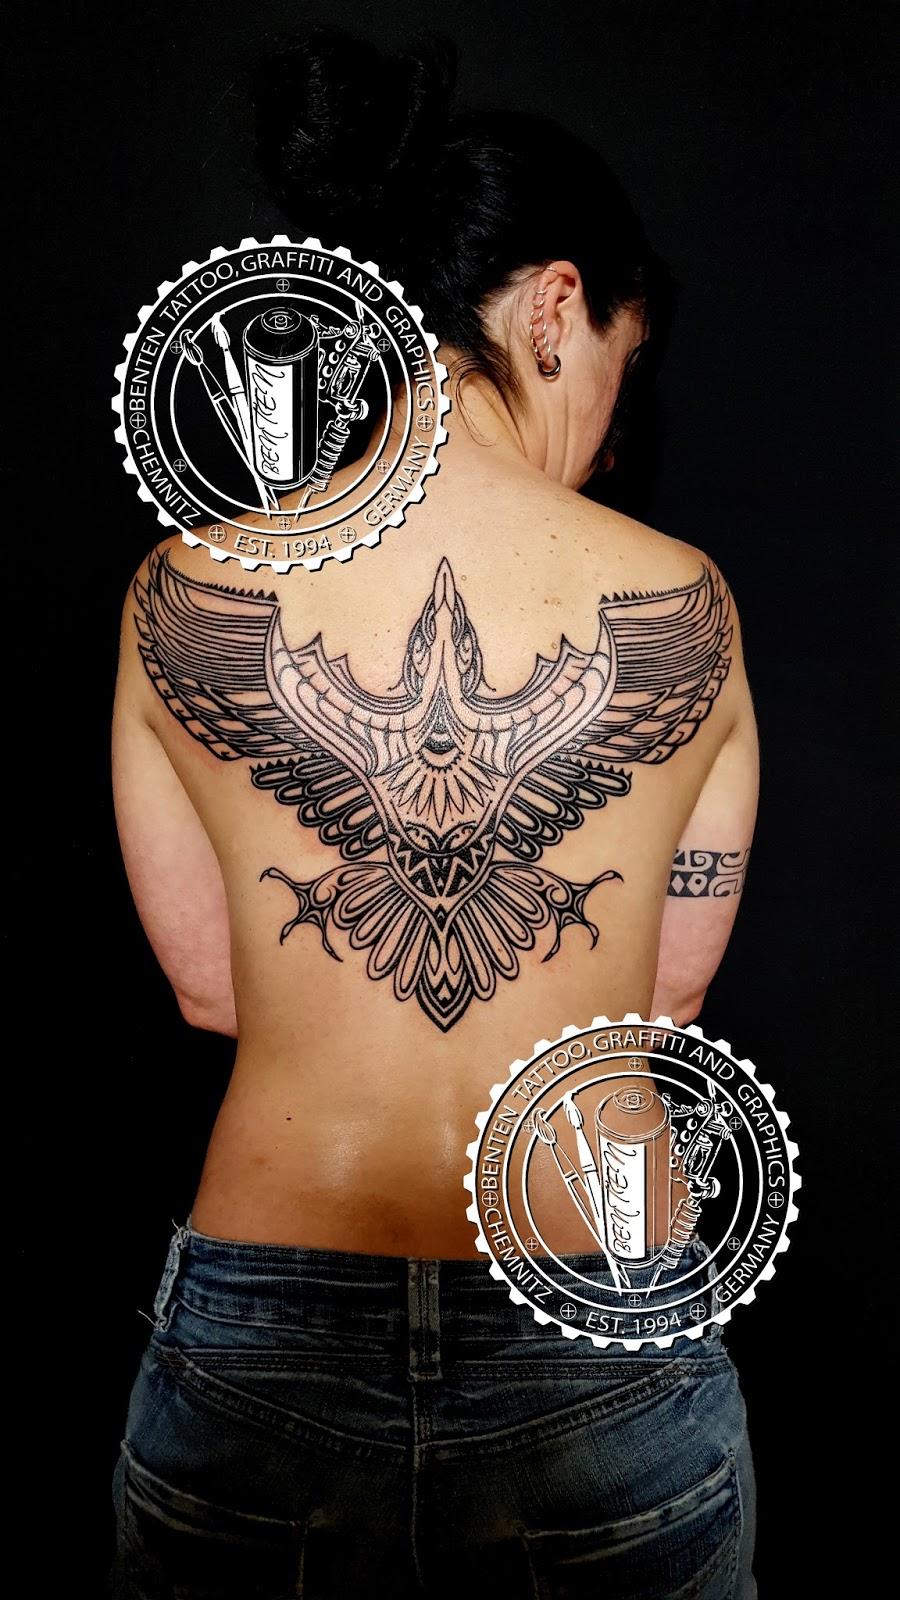 Benten Tattoo Chemnitz - Tattoostudio Chemnitz - Tattoo Studio Chemnitz